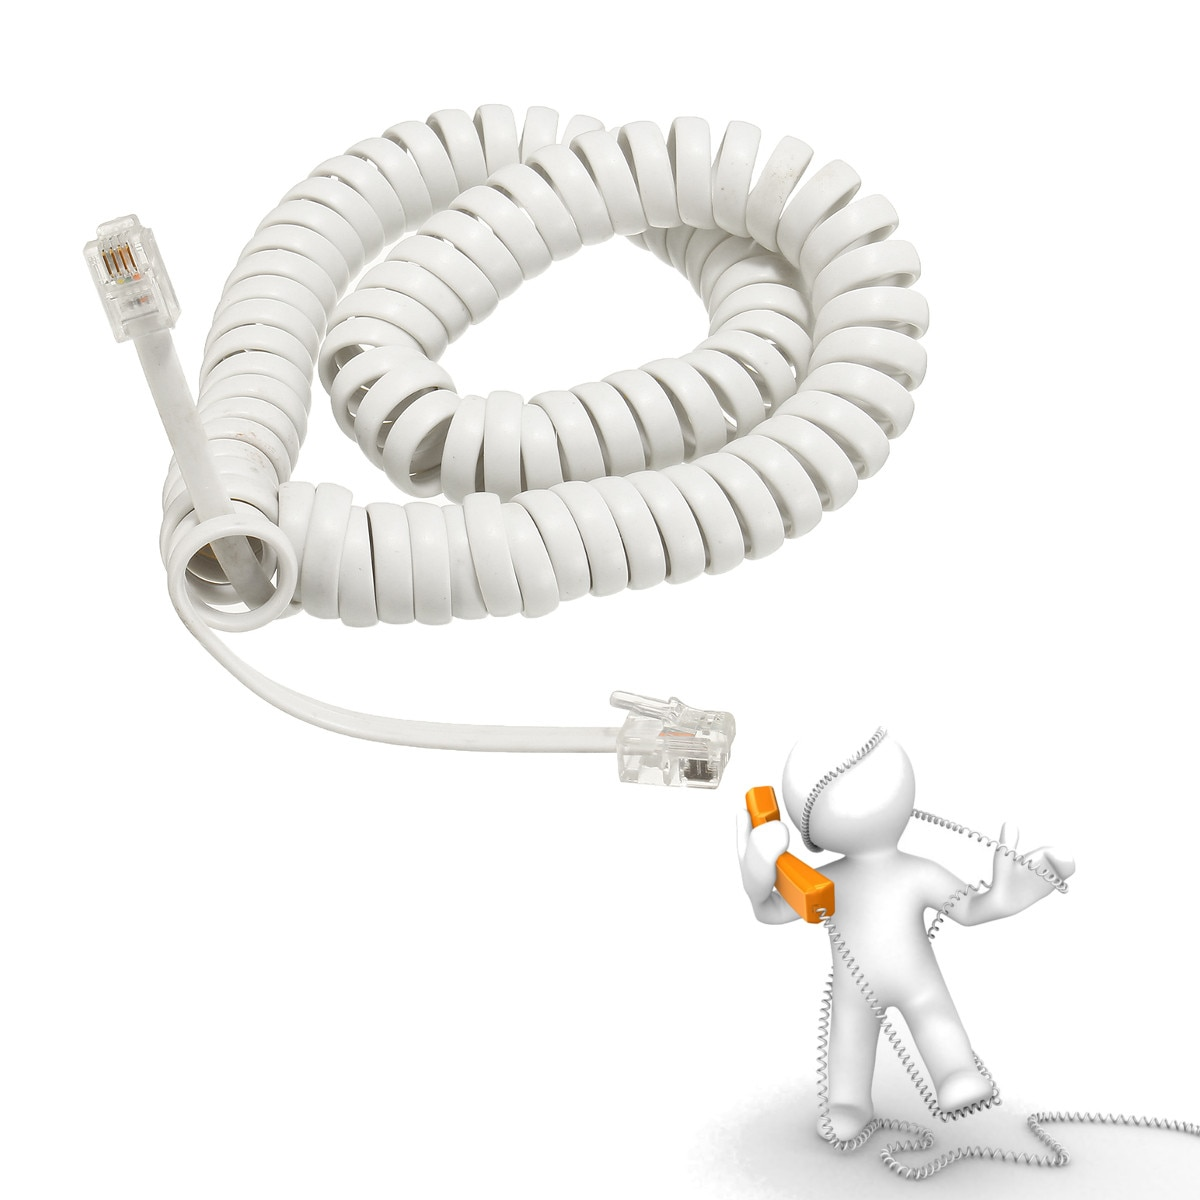 2M negro blanco RJ10 4P4C en espiral Modular Cables de teléfono de alambre casa Oficina Hotel llamada entrante LCD Display teléfono fijo